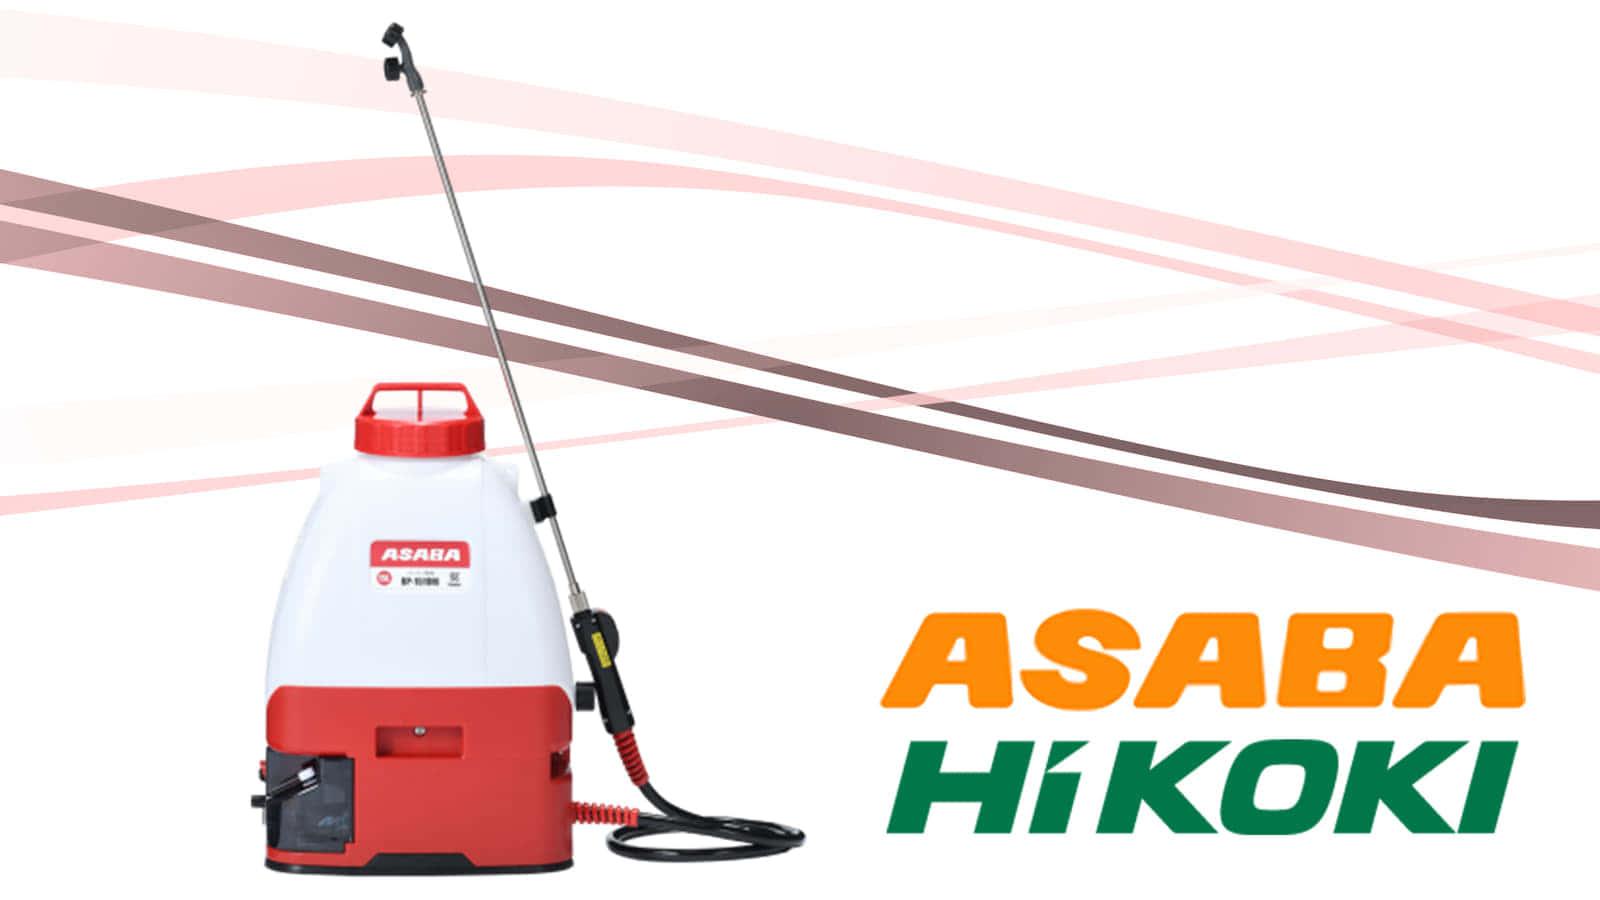 ASABA BP-1510Hi バッテリ動力噴霧器、HiKOKIマルチボルト36Vの噴霧器